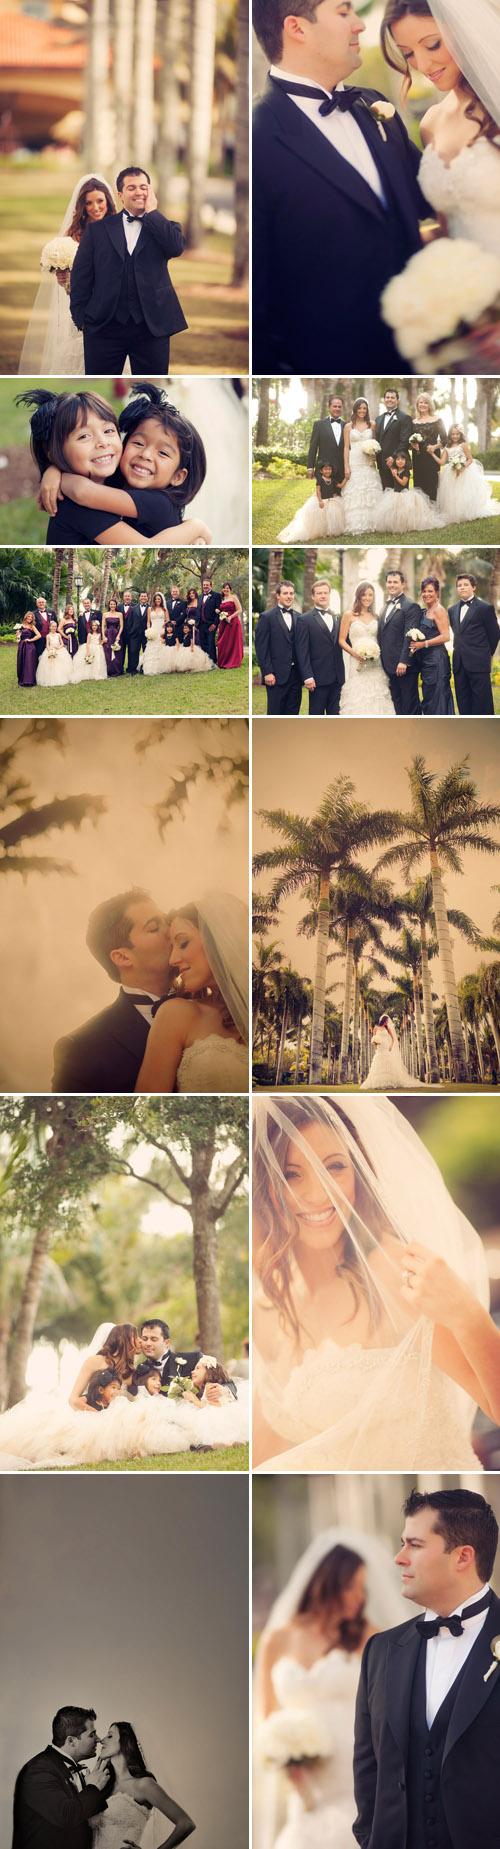 romantic Naples, Florida real wedding at The Ritz Carlton, photos by Jeffrey and Julia Woods